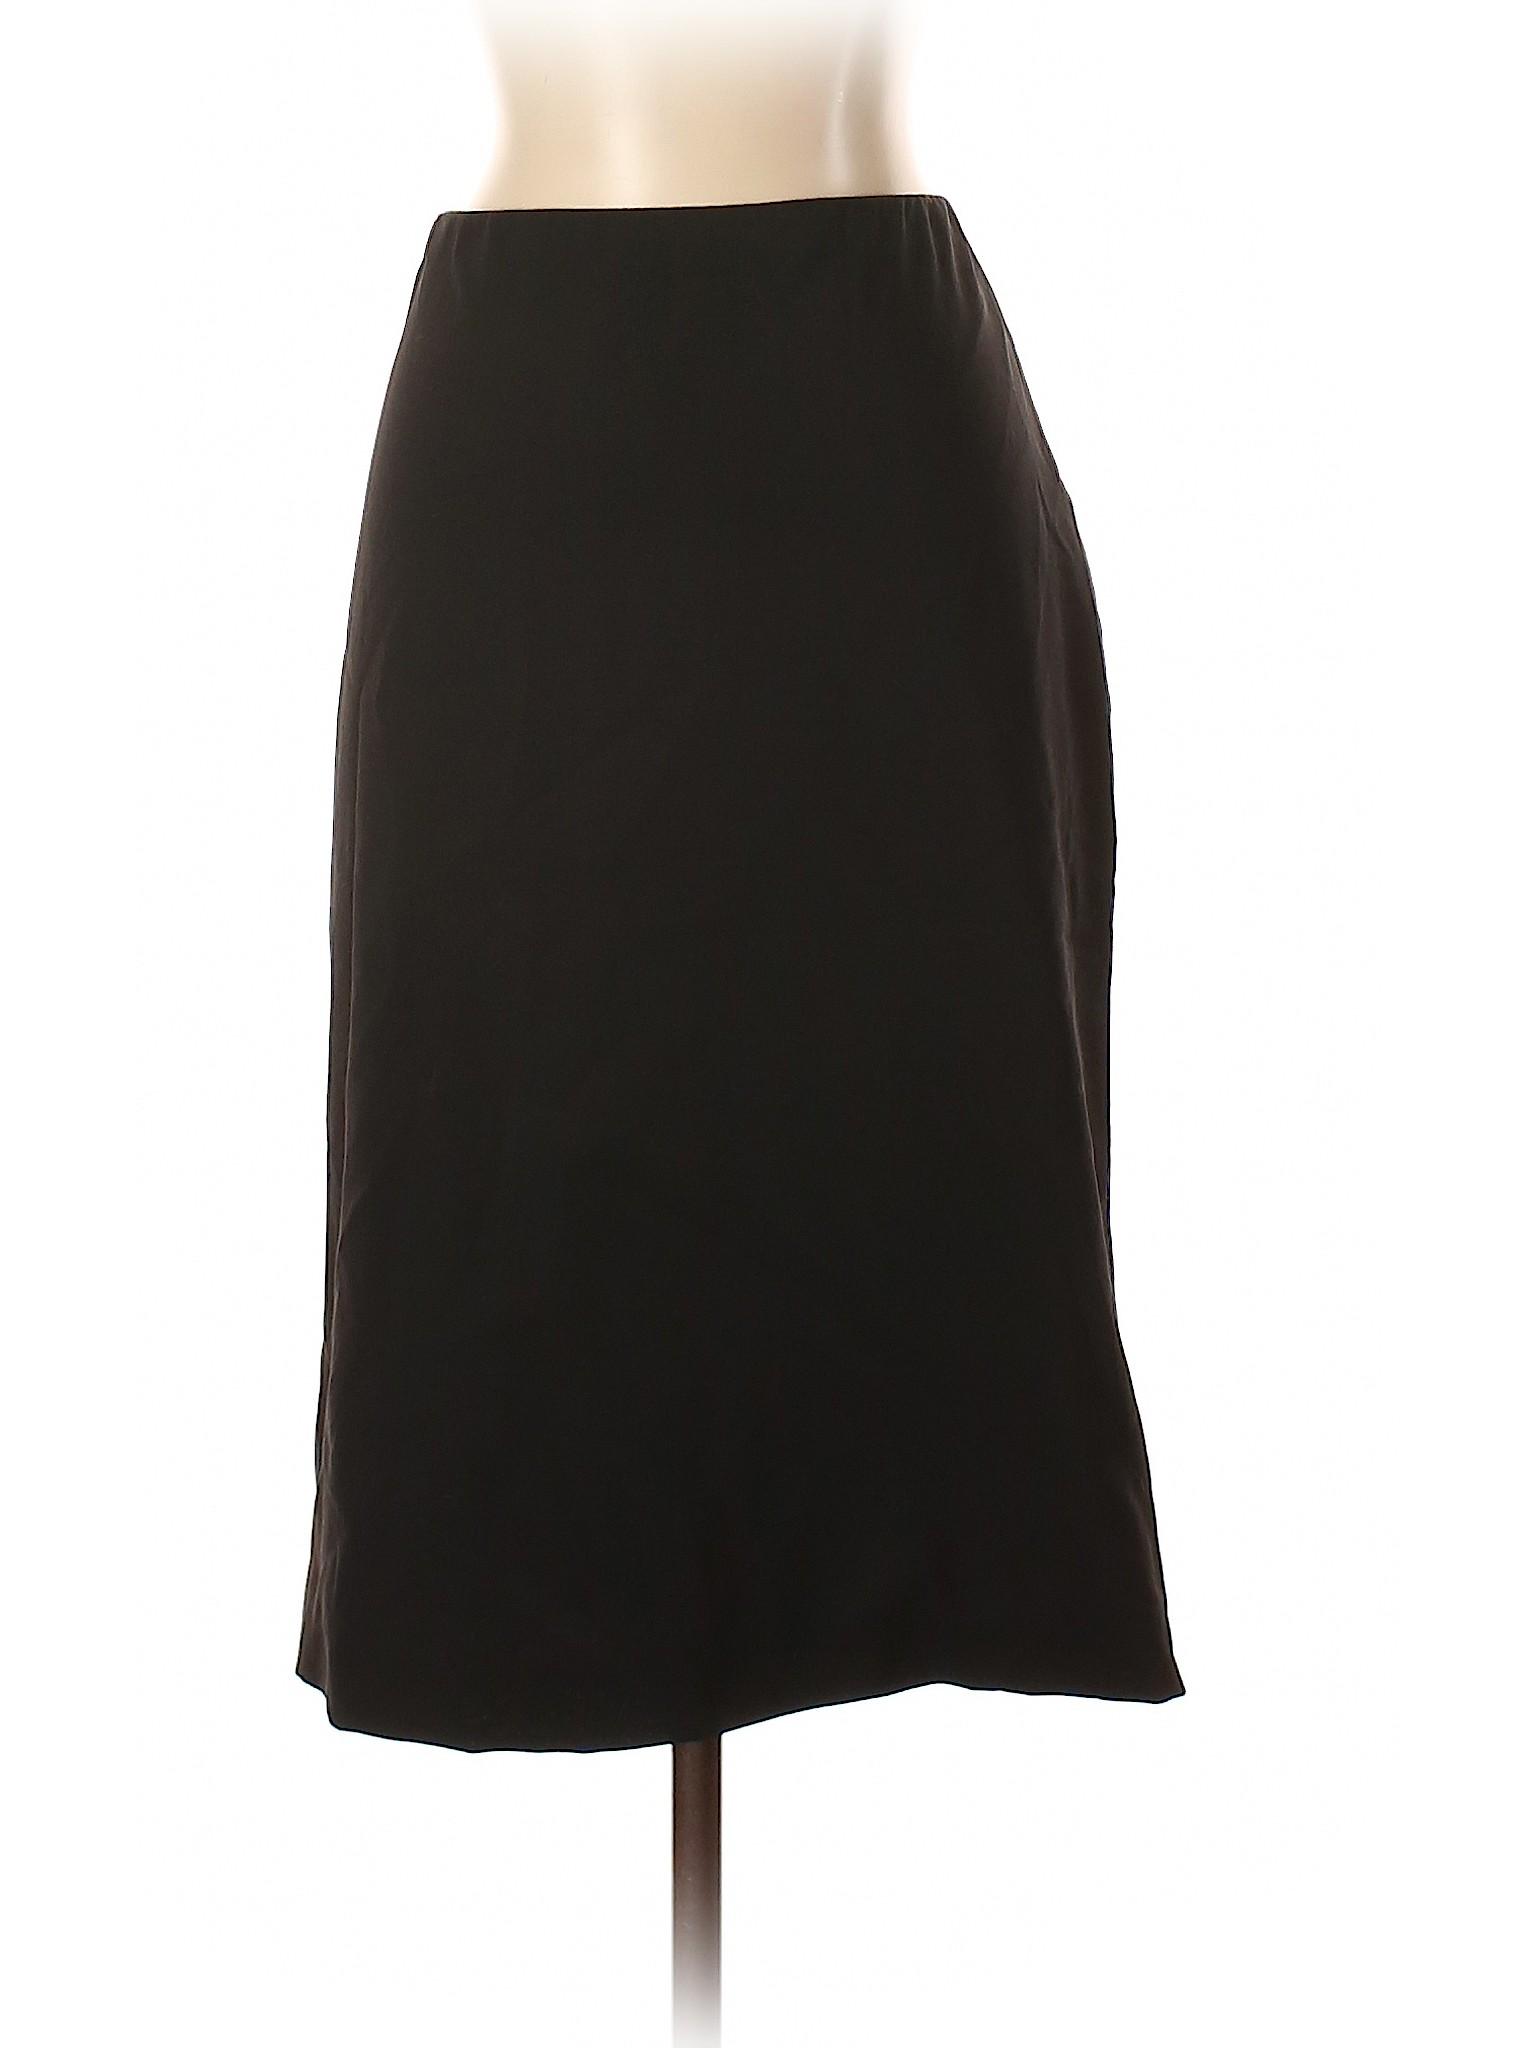 Boutique Wool leisure Gabbana Skirt amp; Dolce rq6rZPR0n